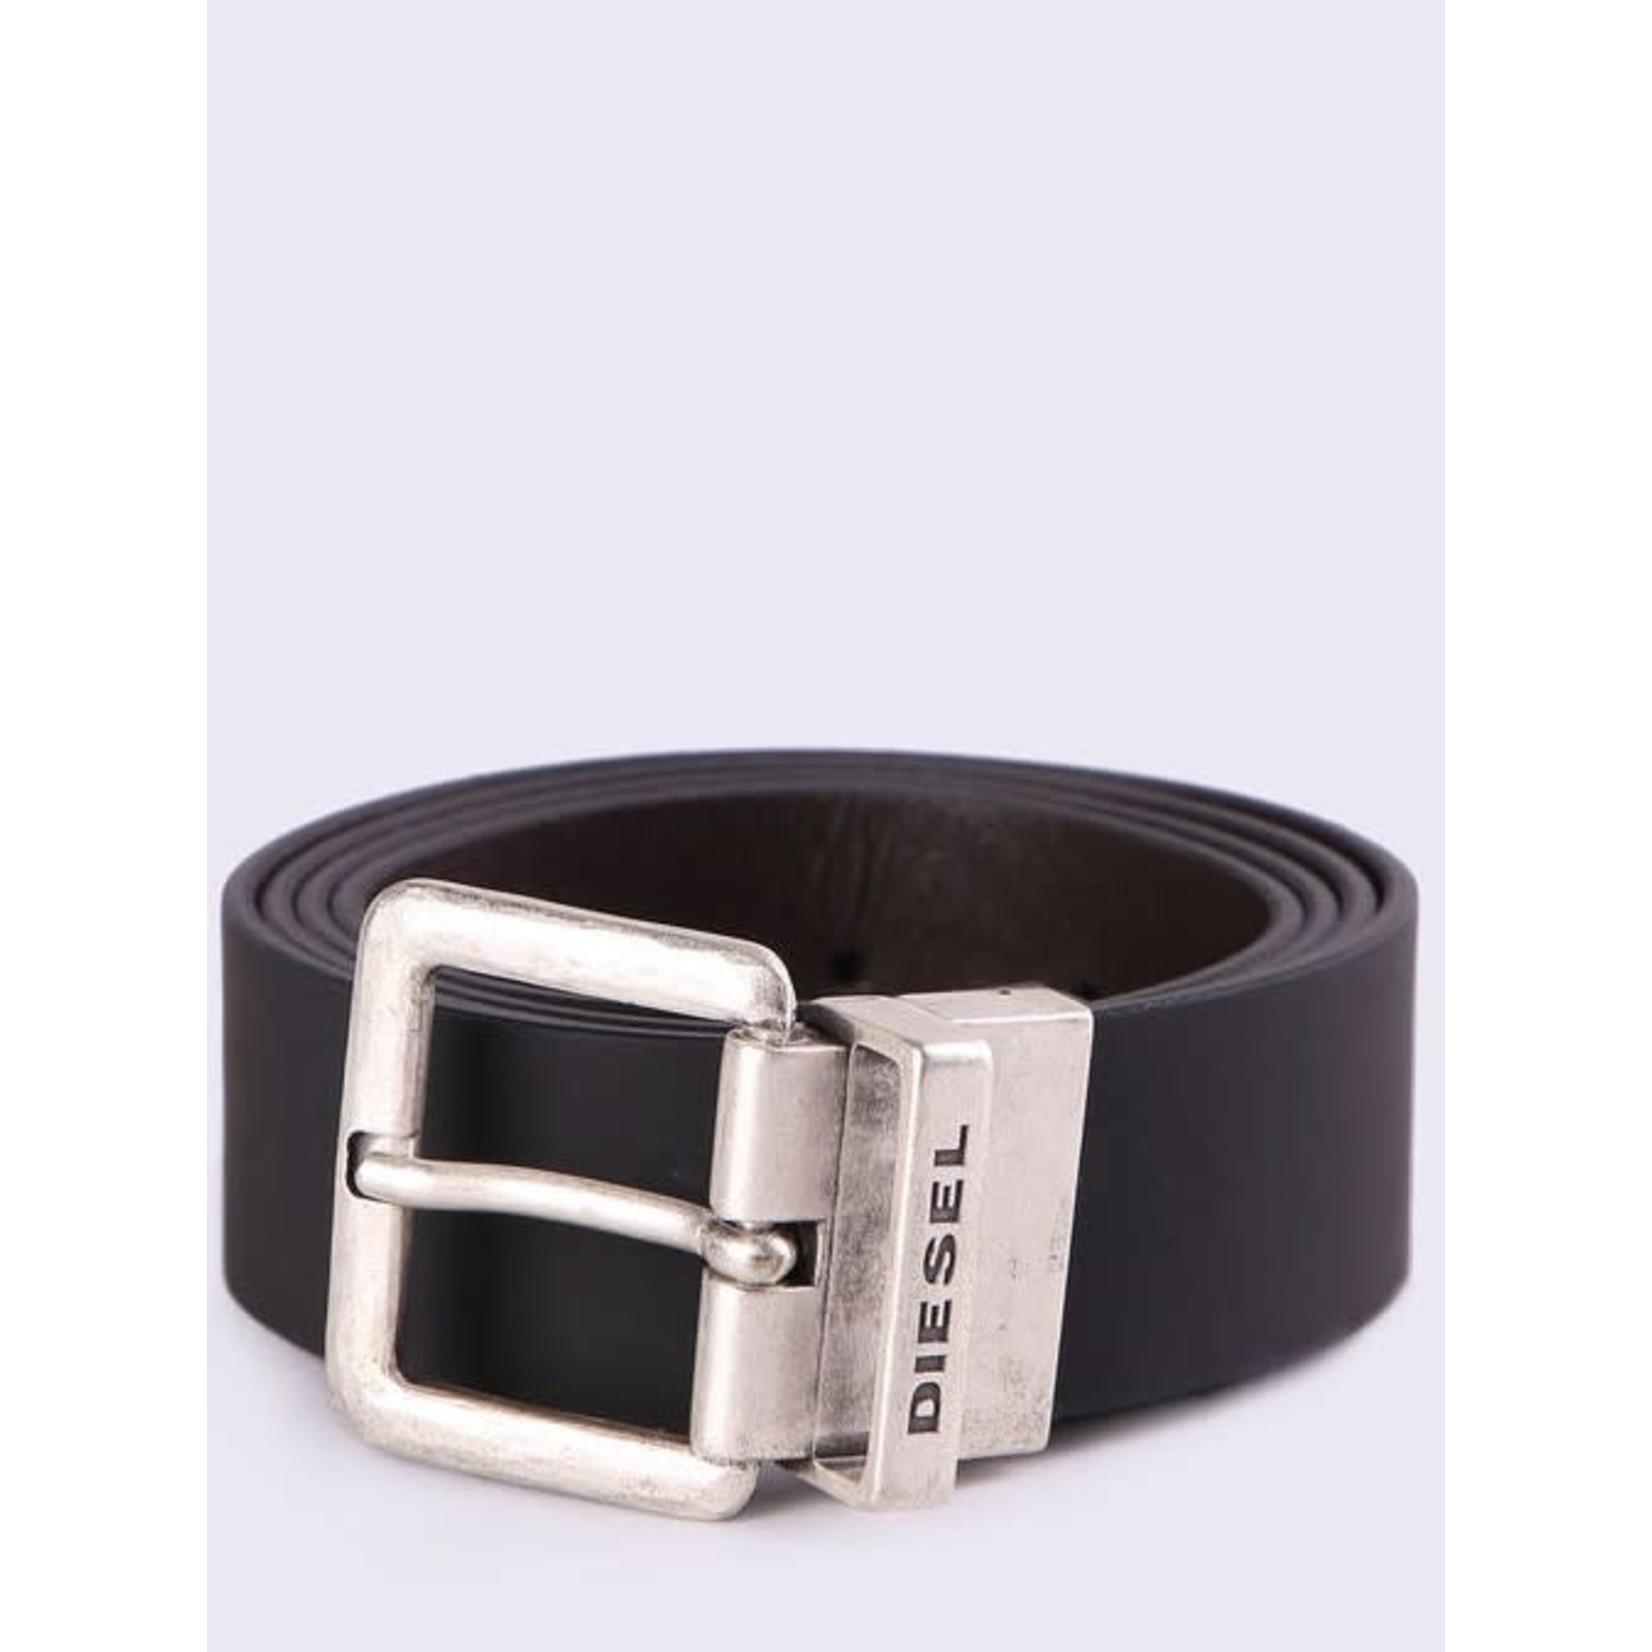 DIESEL Diesel - Men's Belt - B-DoubleC